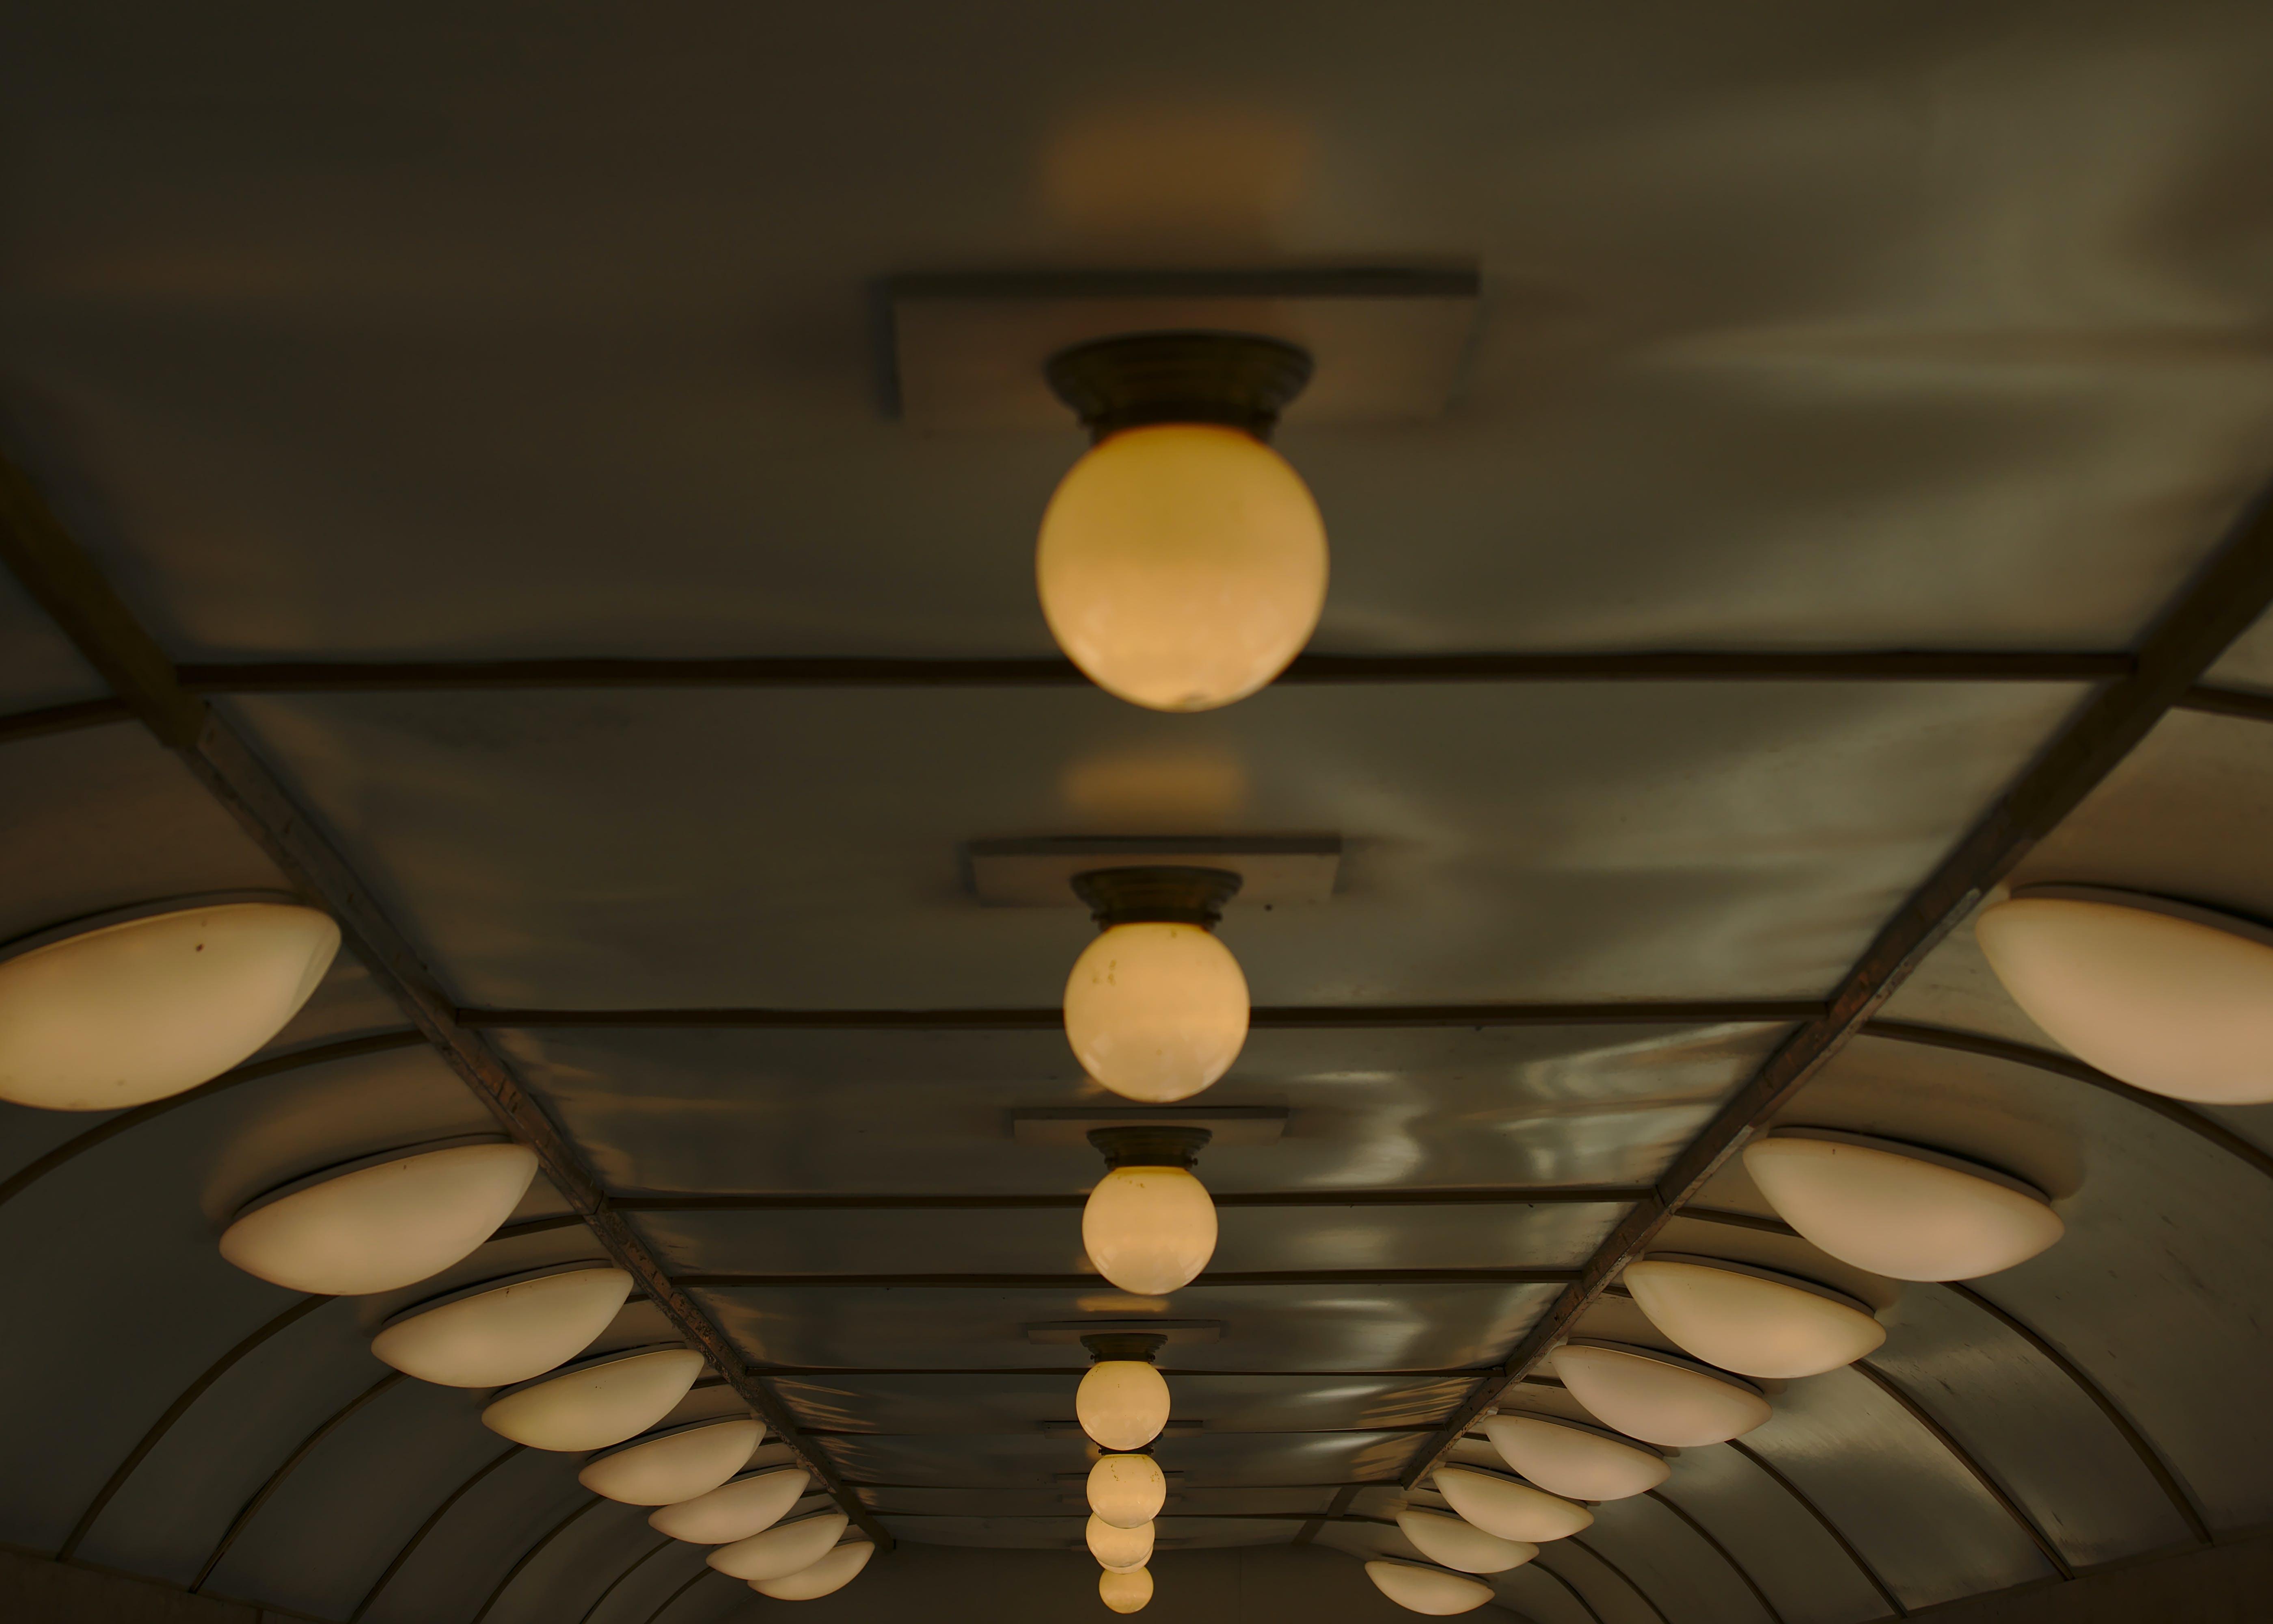 Free stock photo of lights, train, lights in train